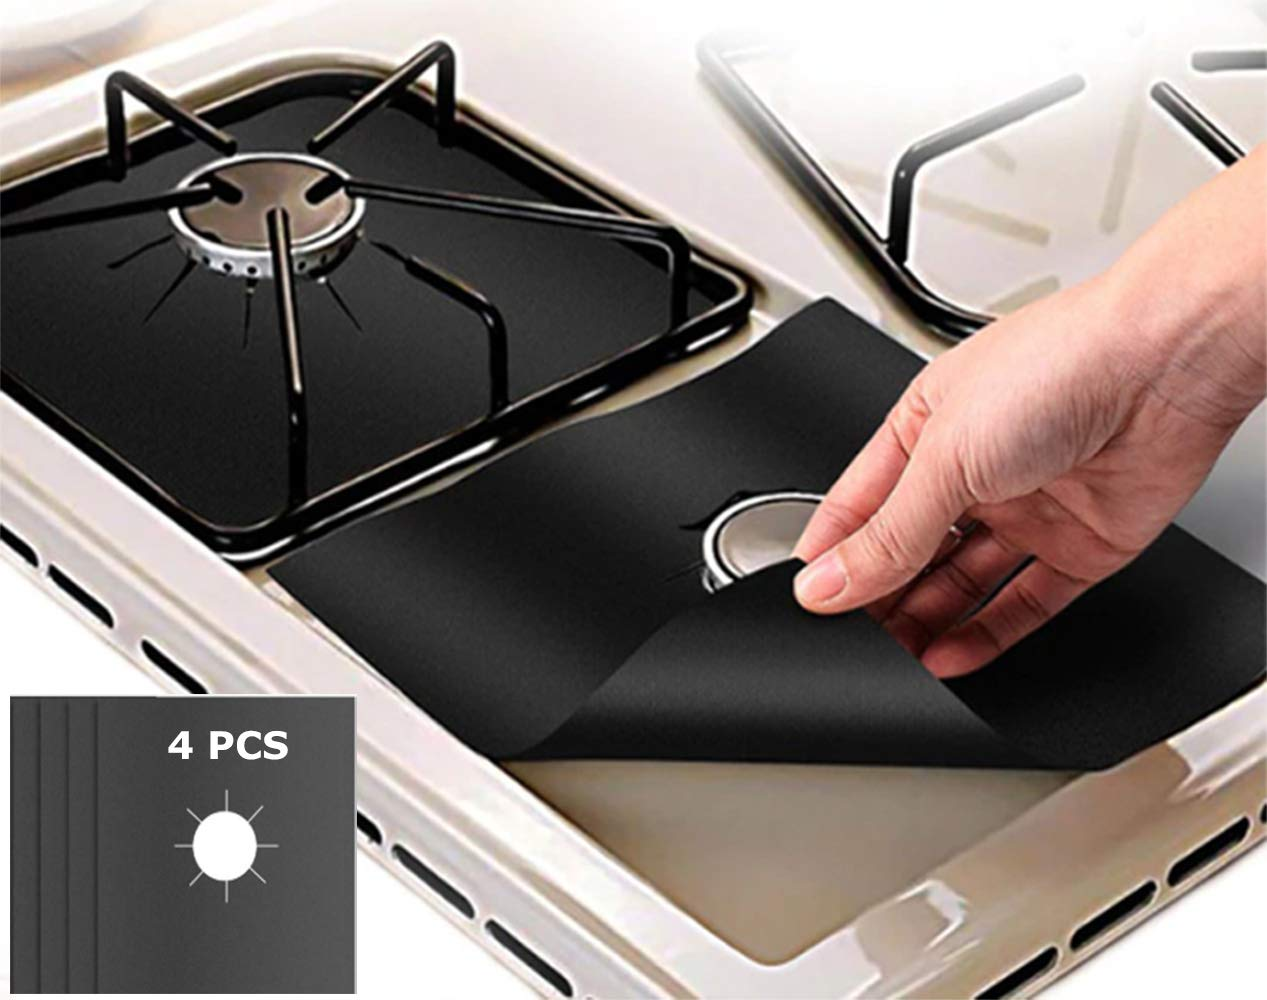 Gas Range Glass Hob or cooker burner cover Gas Stove Burner Cover Reusable Non-stick Stovetop Burner Liners